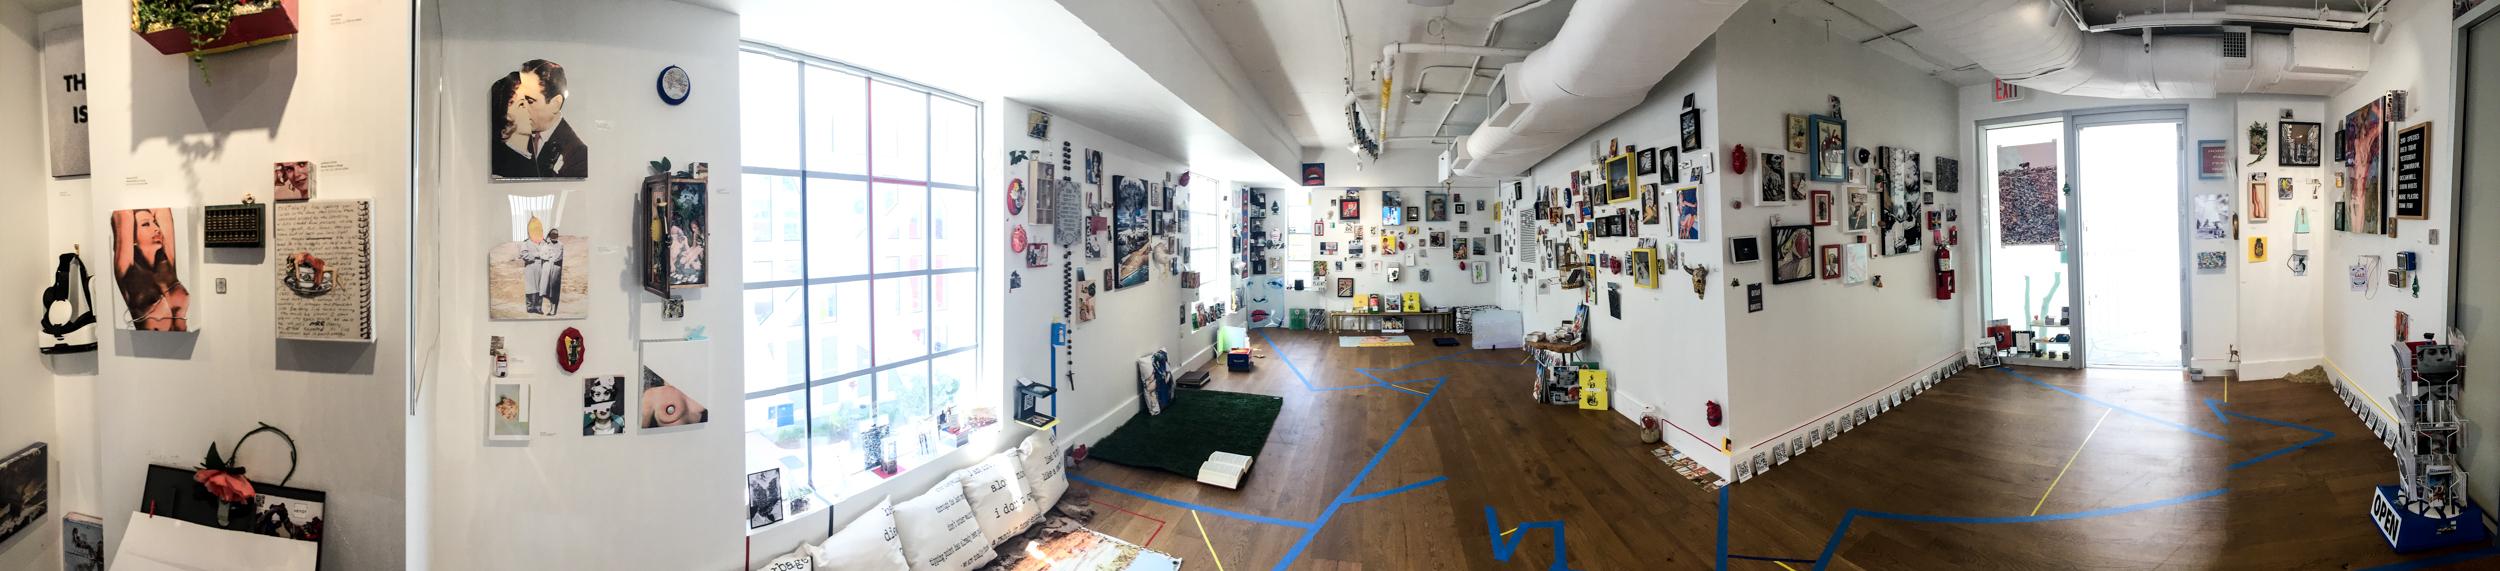 Faena-Exhibition-Images-17.jpg